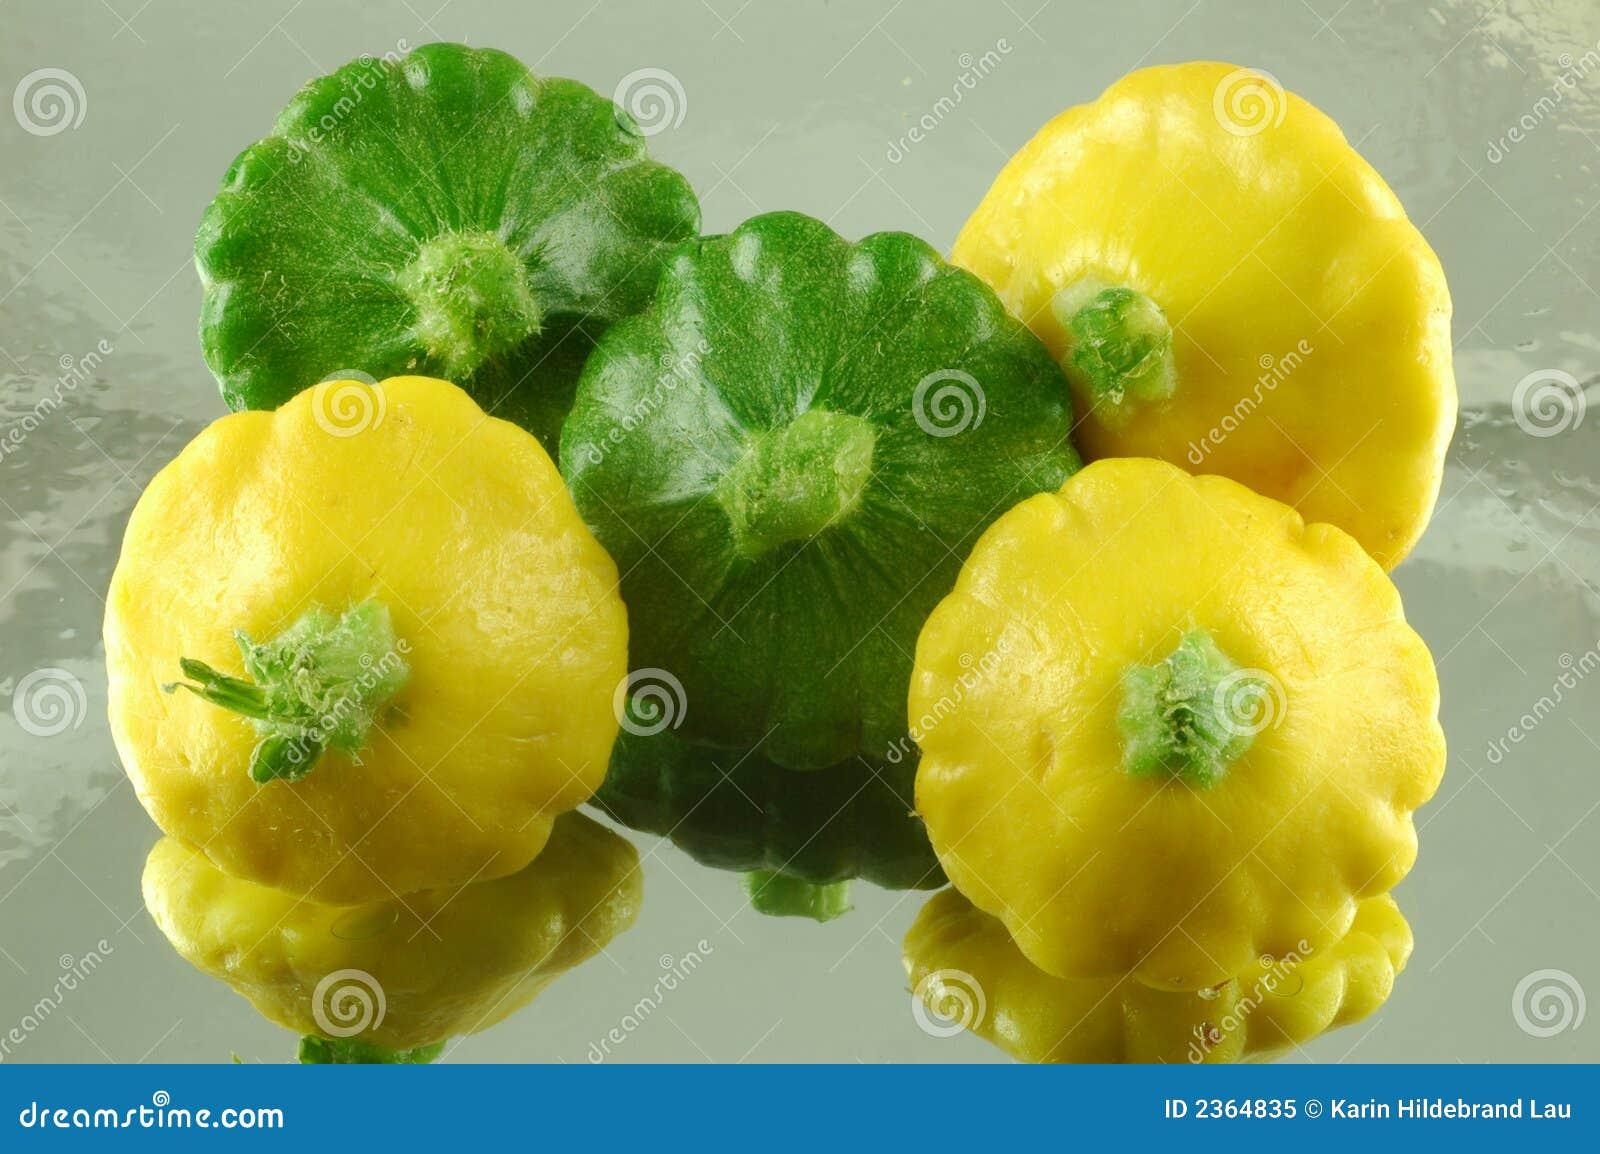 Zucchini insertion